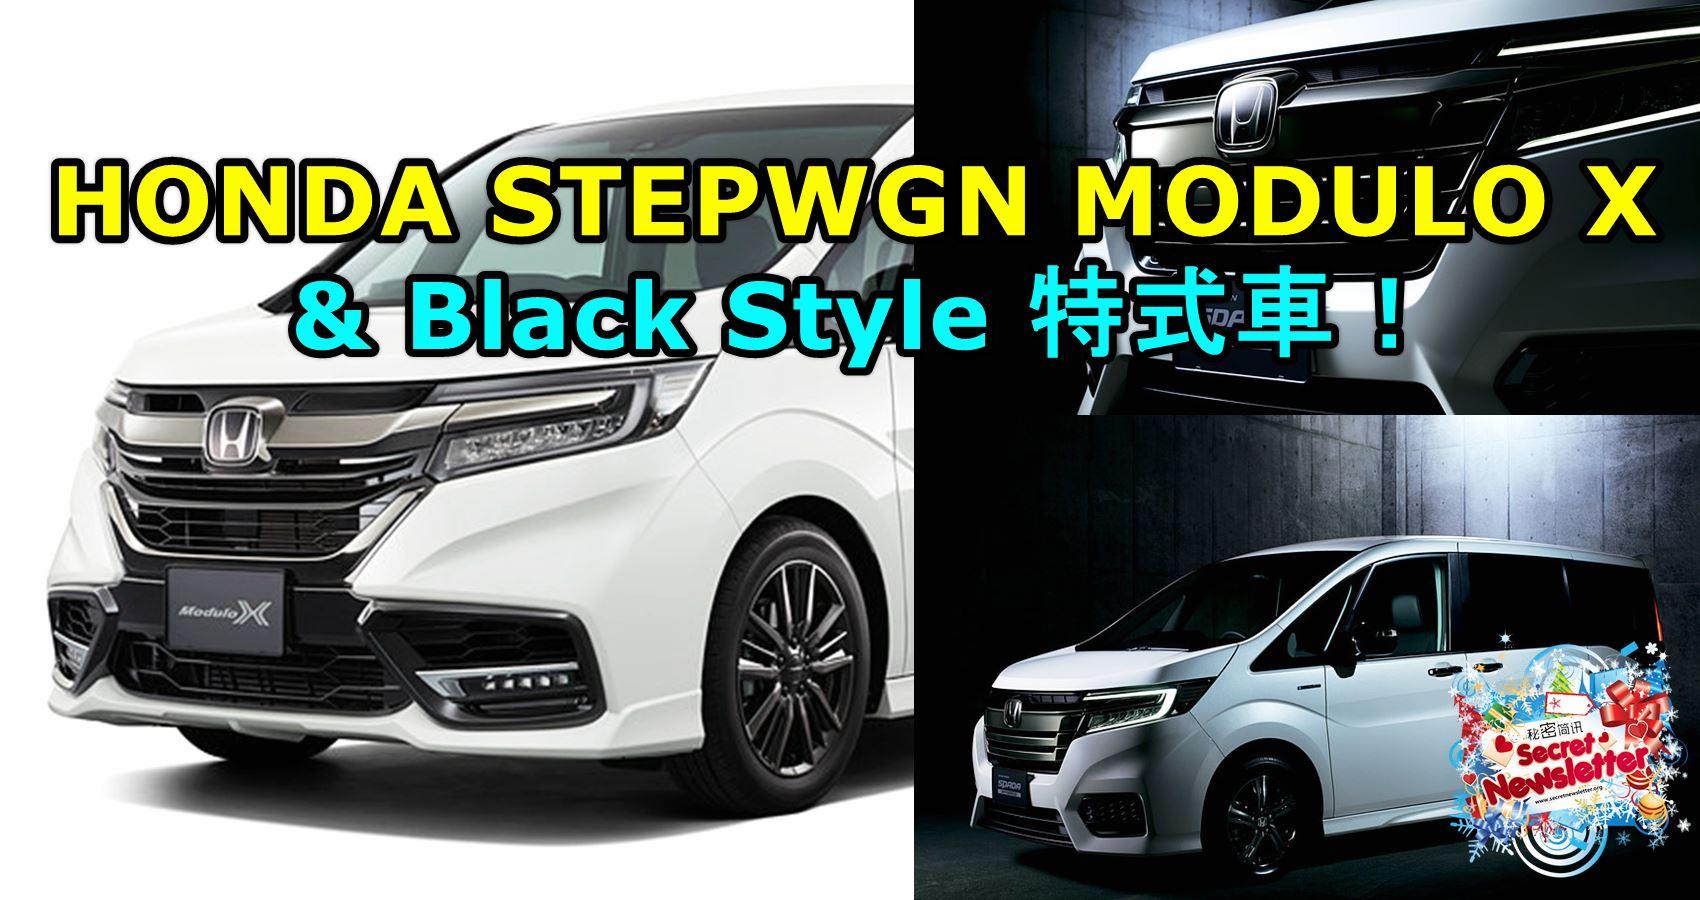 2019 HONDA STEPWGN MODULO X & Black Style 特式車! - JUSTYOU